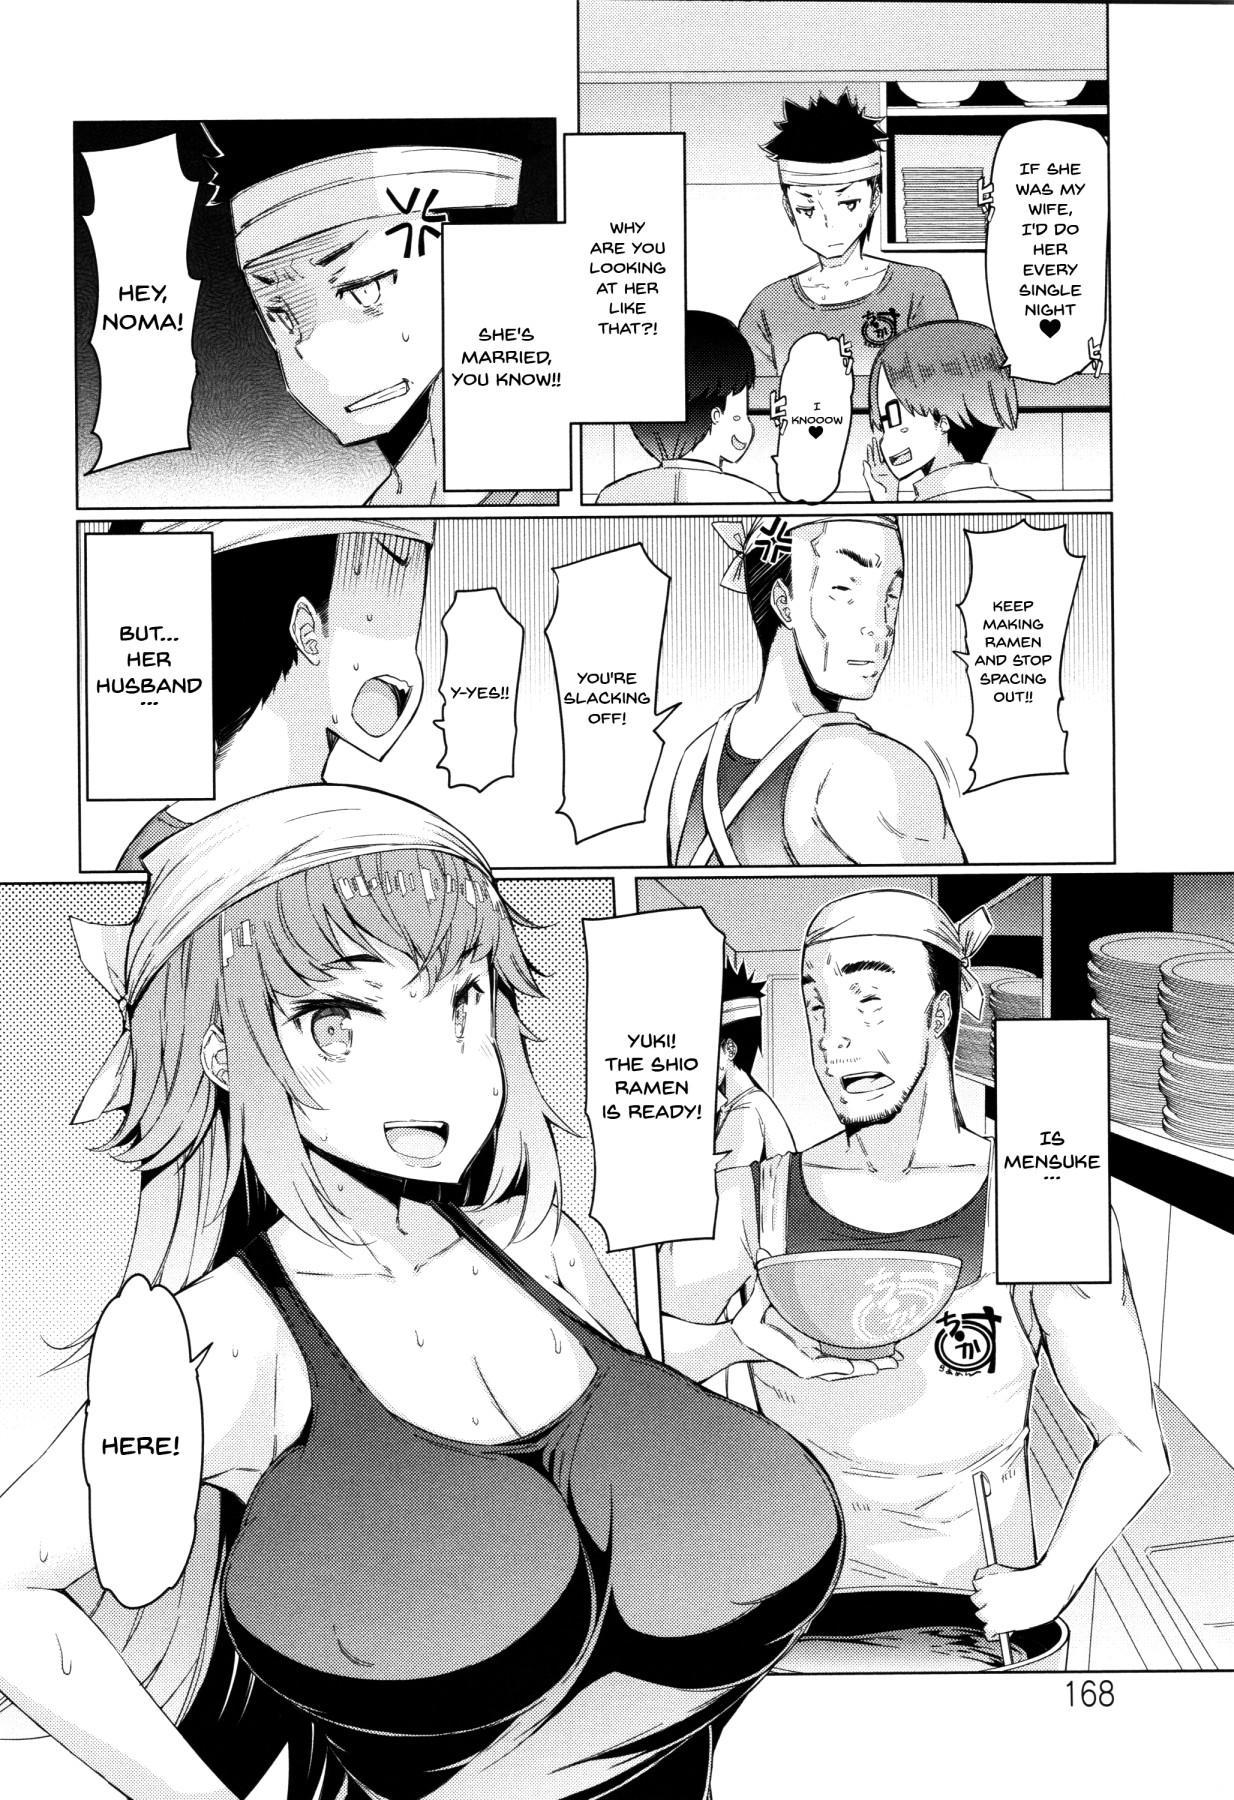 Hitozuma ga Ero Sugite Shigoto ni Naranai! | These Housewives Are Too Lewd I Can't Help It! 167